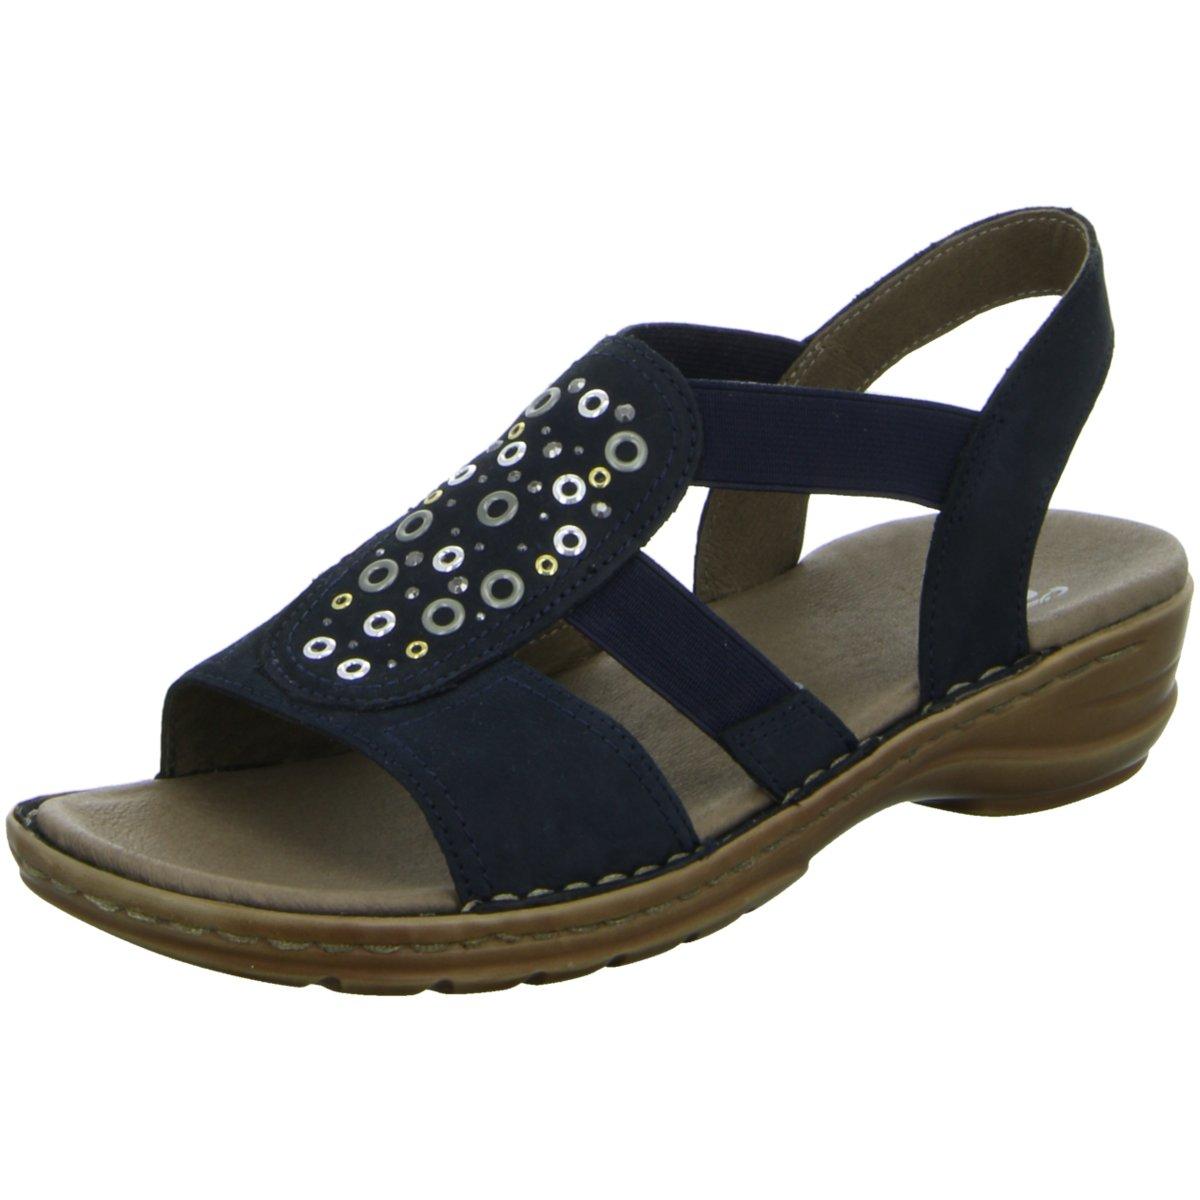 Sandalette Blau 37246 12 Damen Ara 132440 Hawai Sandaletten Sportlicher Boden CerdxBo